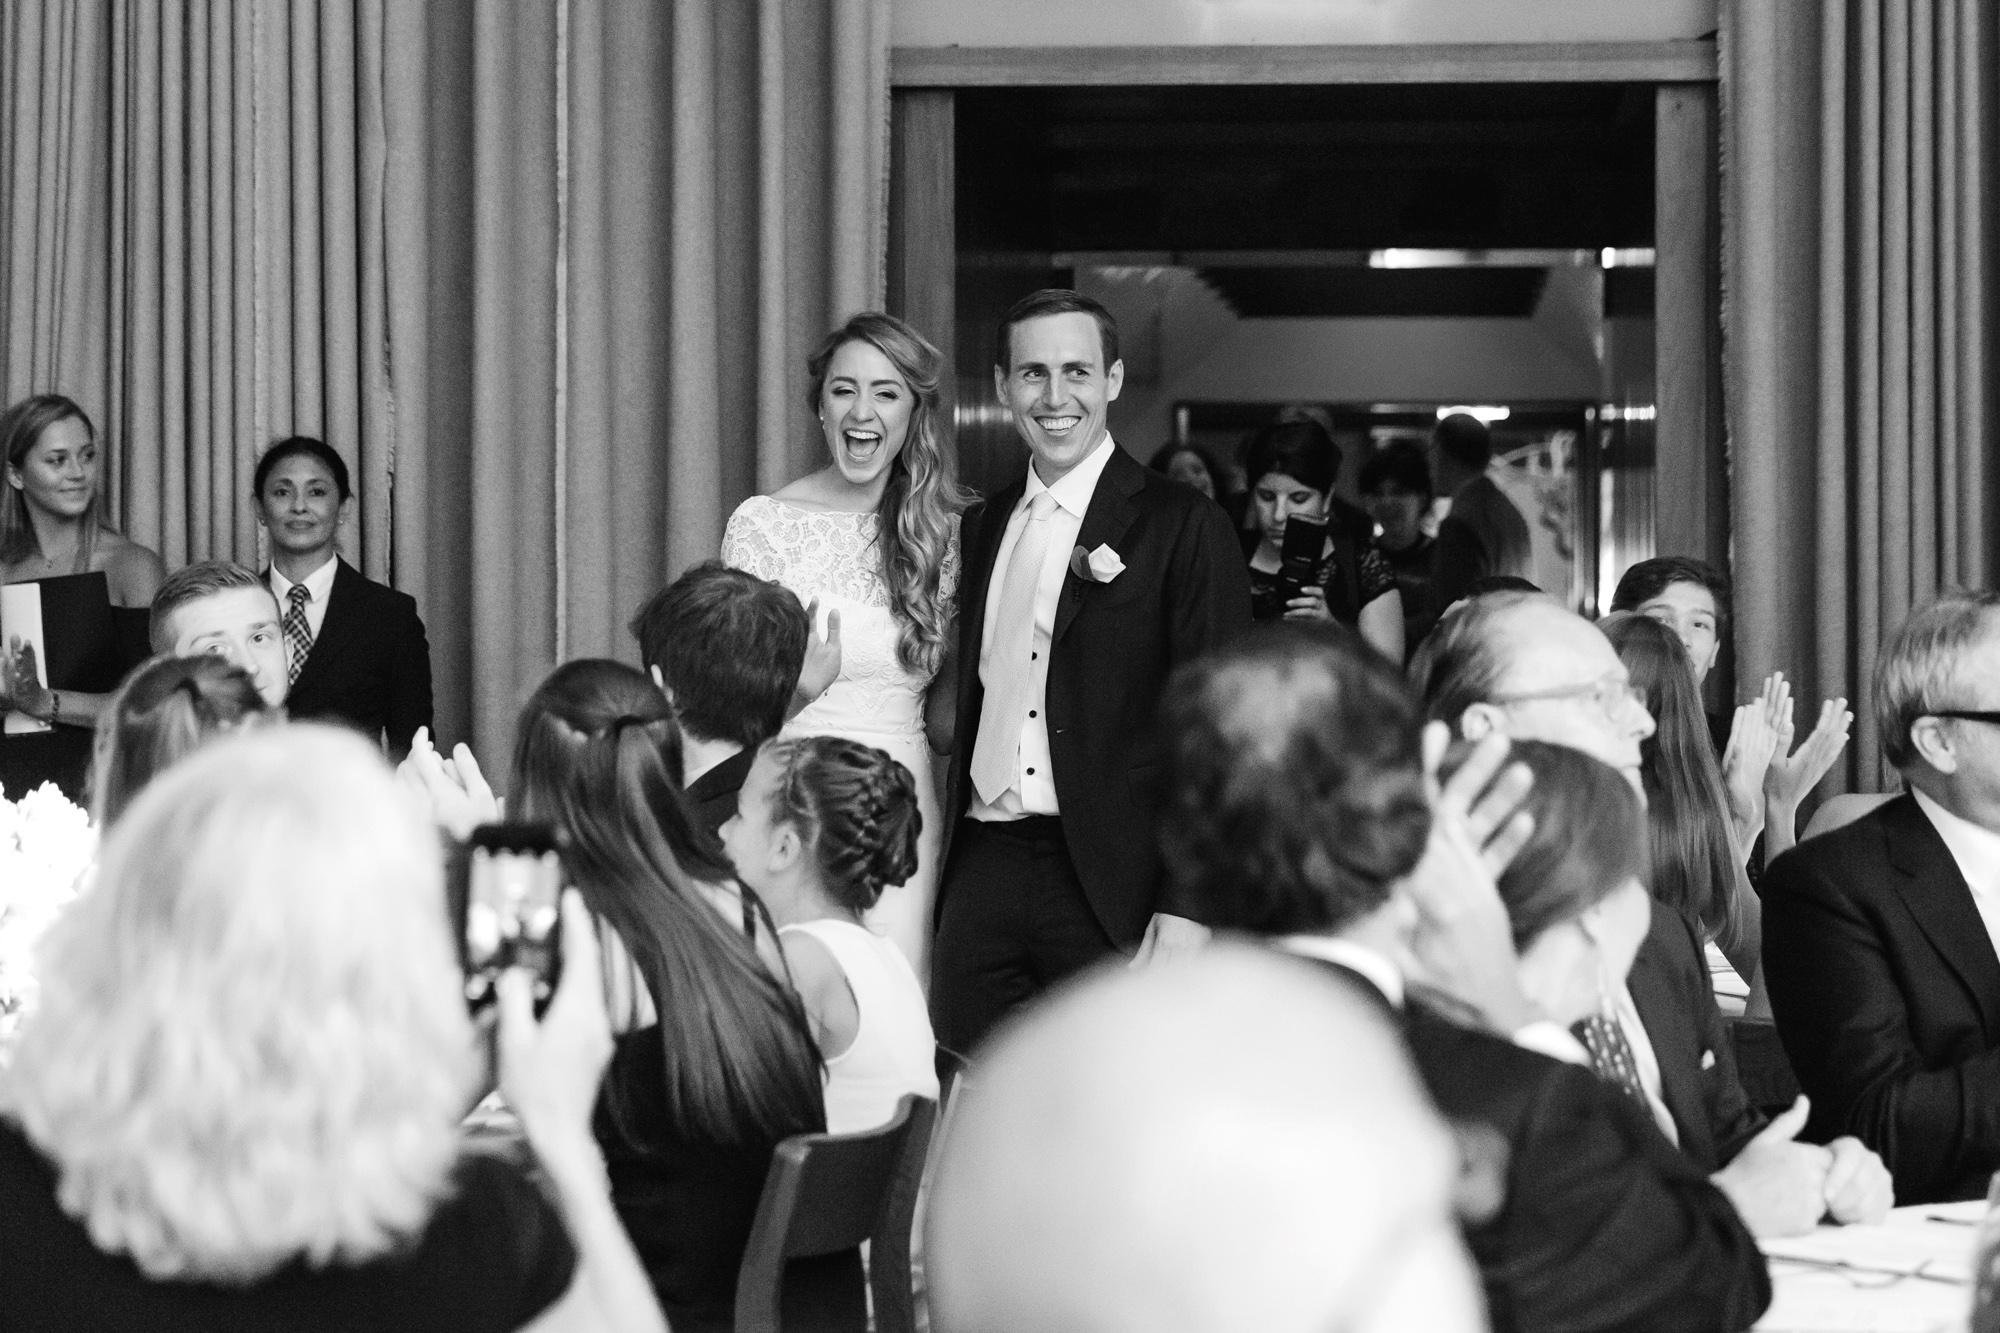 58_Jessica_Ted_Blue_Hill_Stone_Barns_Wedding_Pocantico_NY_Tanya_Salazar_Photography_163.jpg